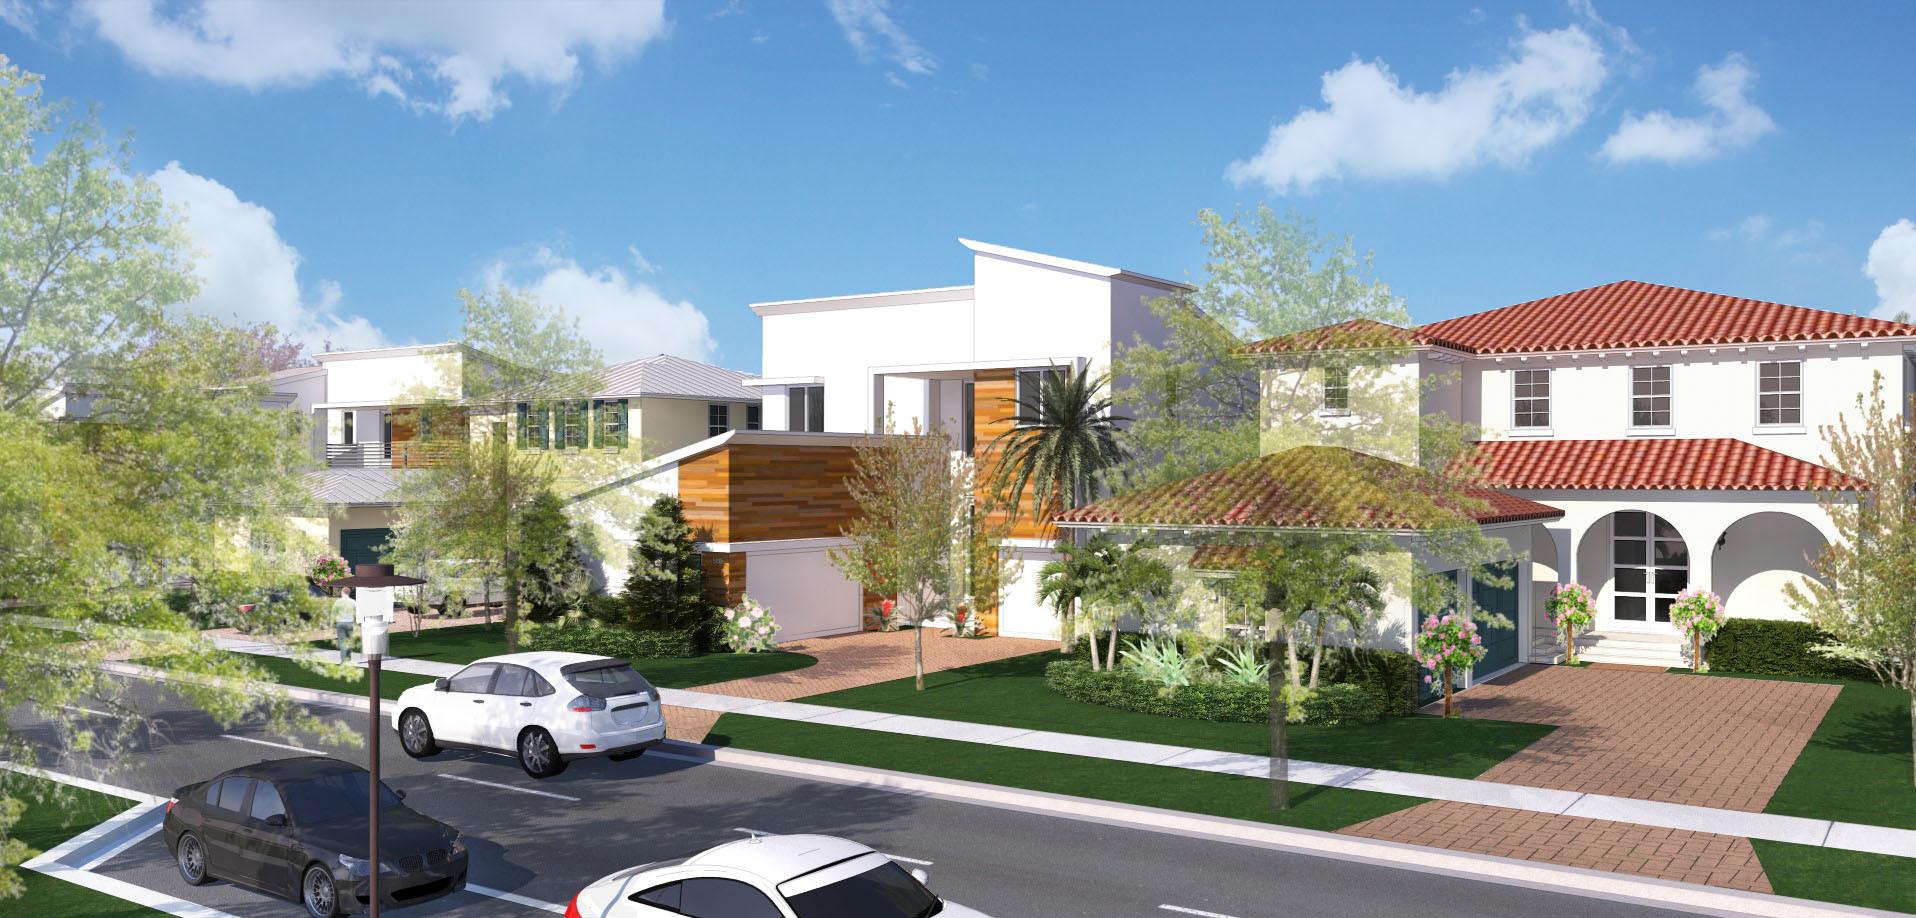 Alton Homes West Palm Beach Fl